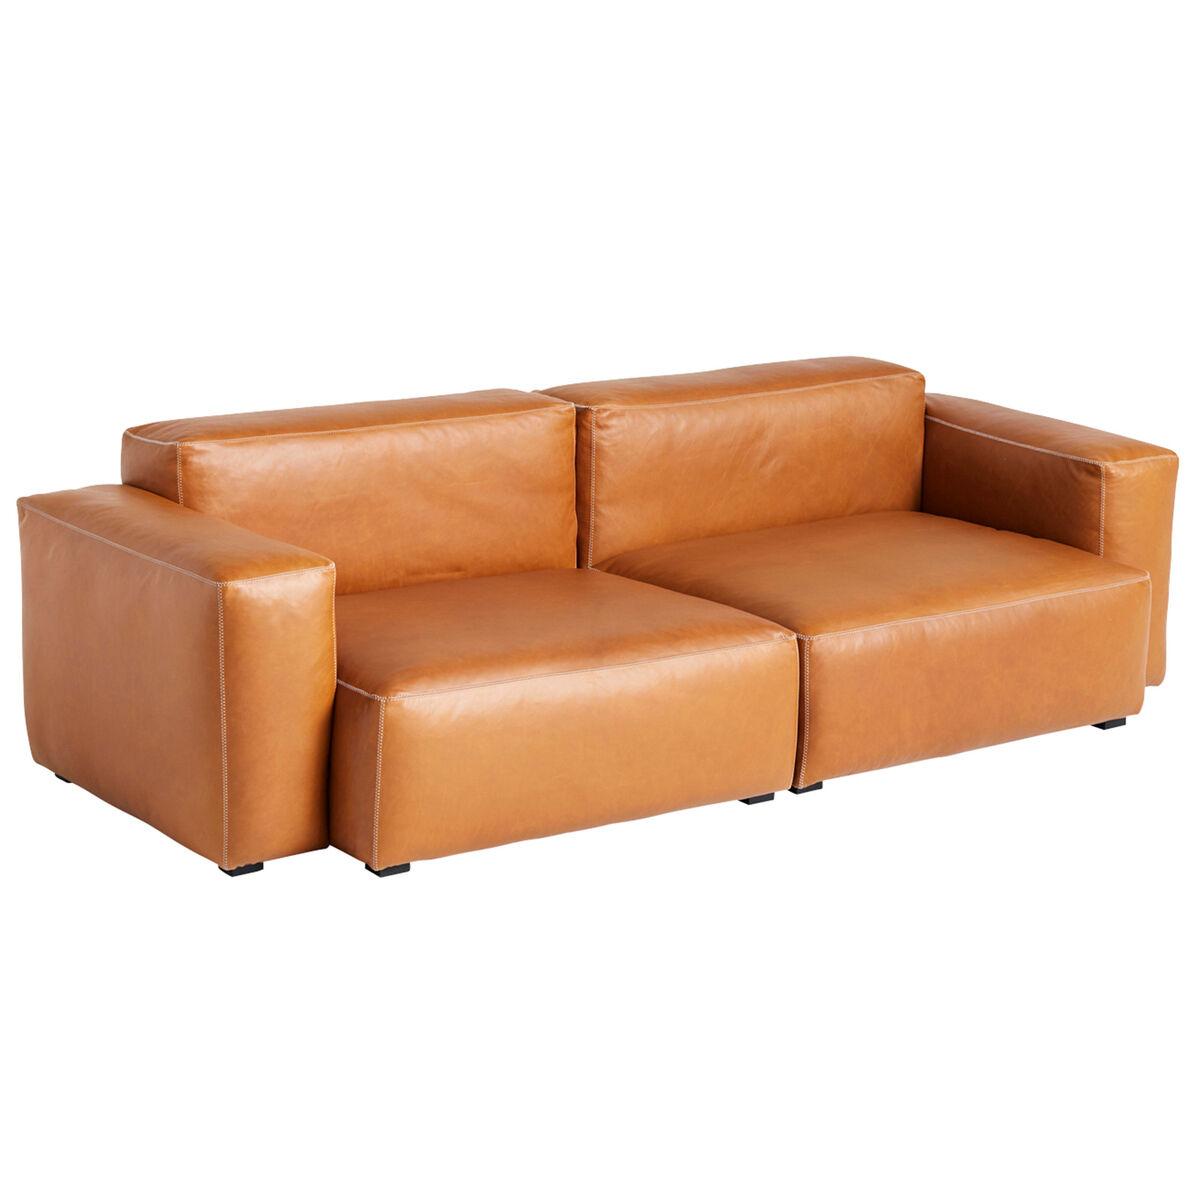 Hay Mags Soft sohva 2,5-ist/228 cm, matala k�sinoja, Silk 0250